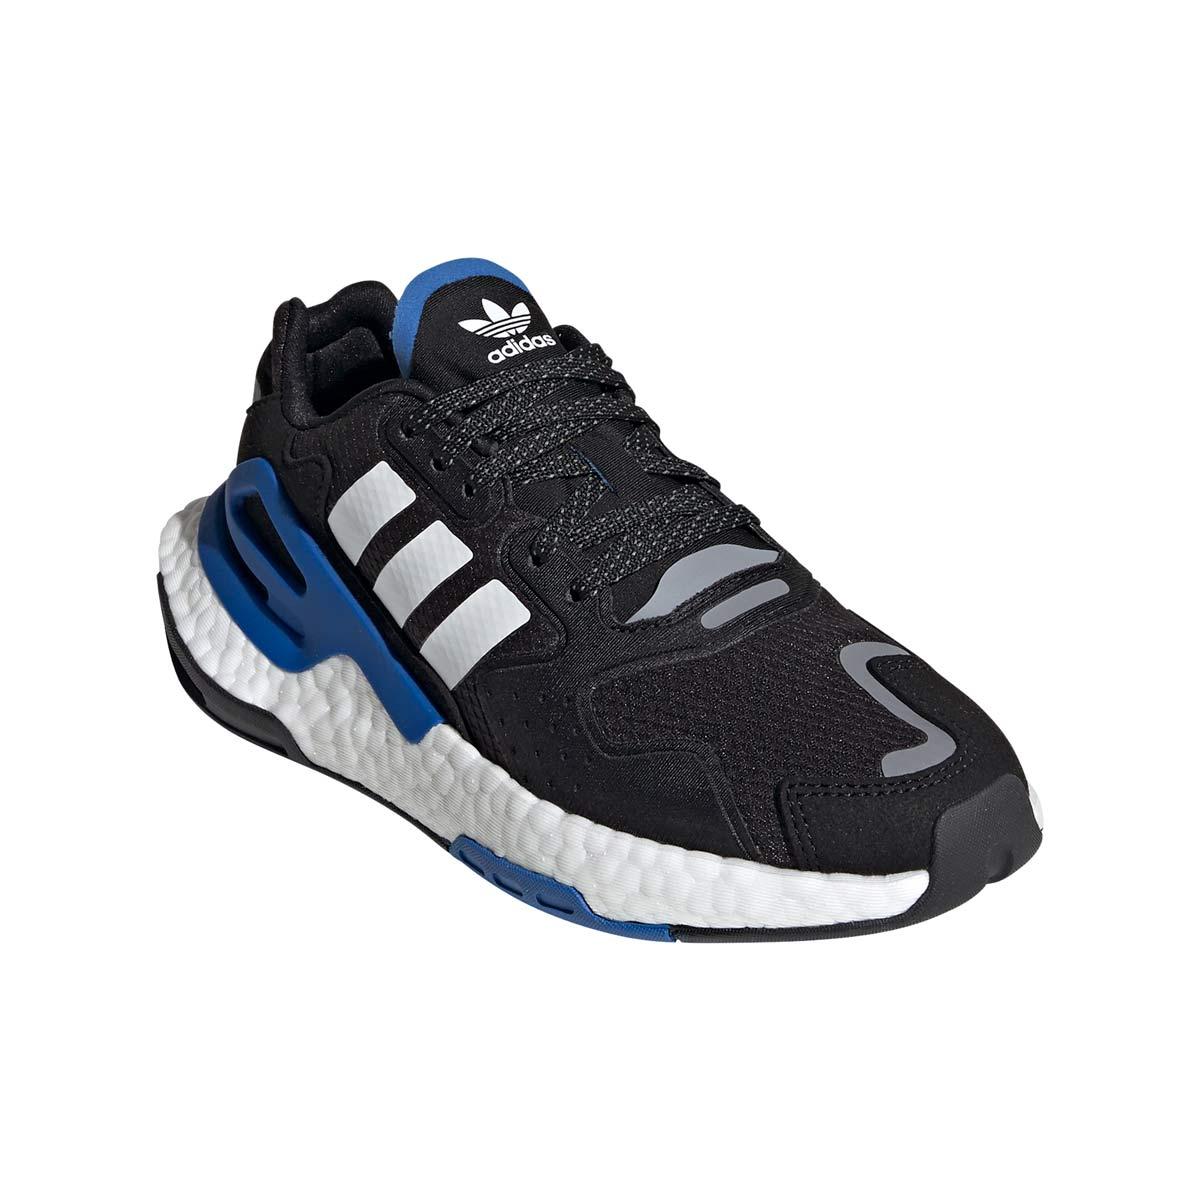 Tenis-Adidas-Day-Jogger-J--33-ao-37-FW5228--4Q20-